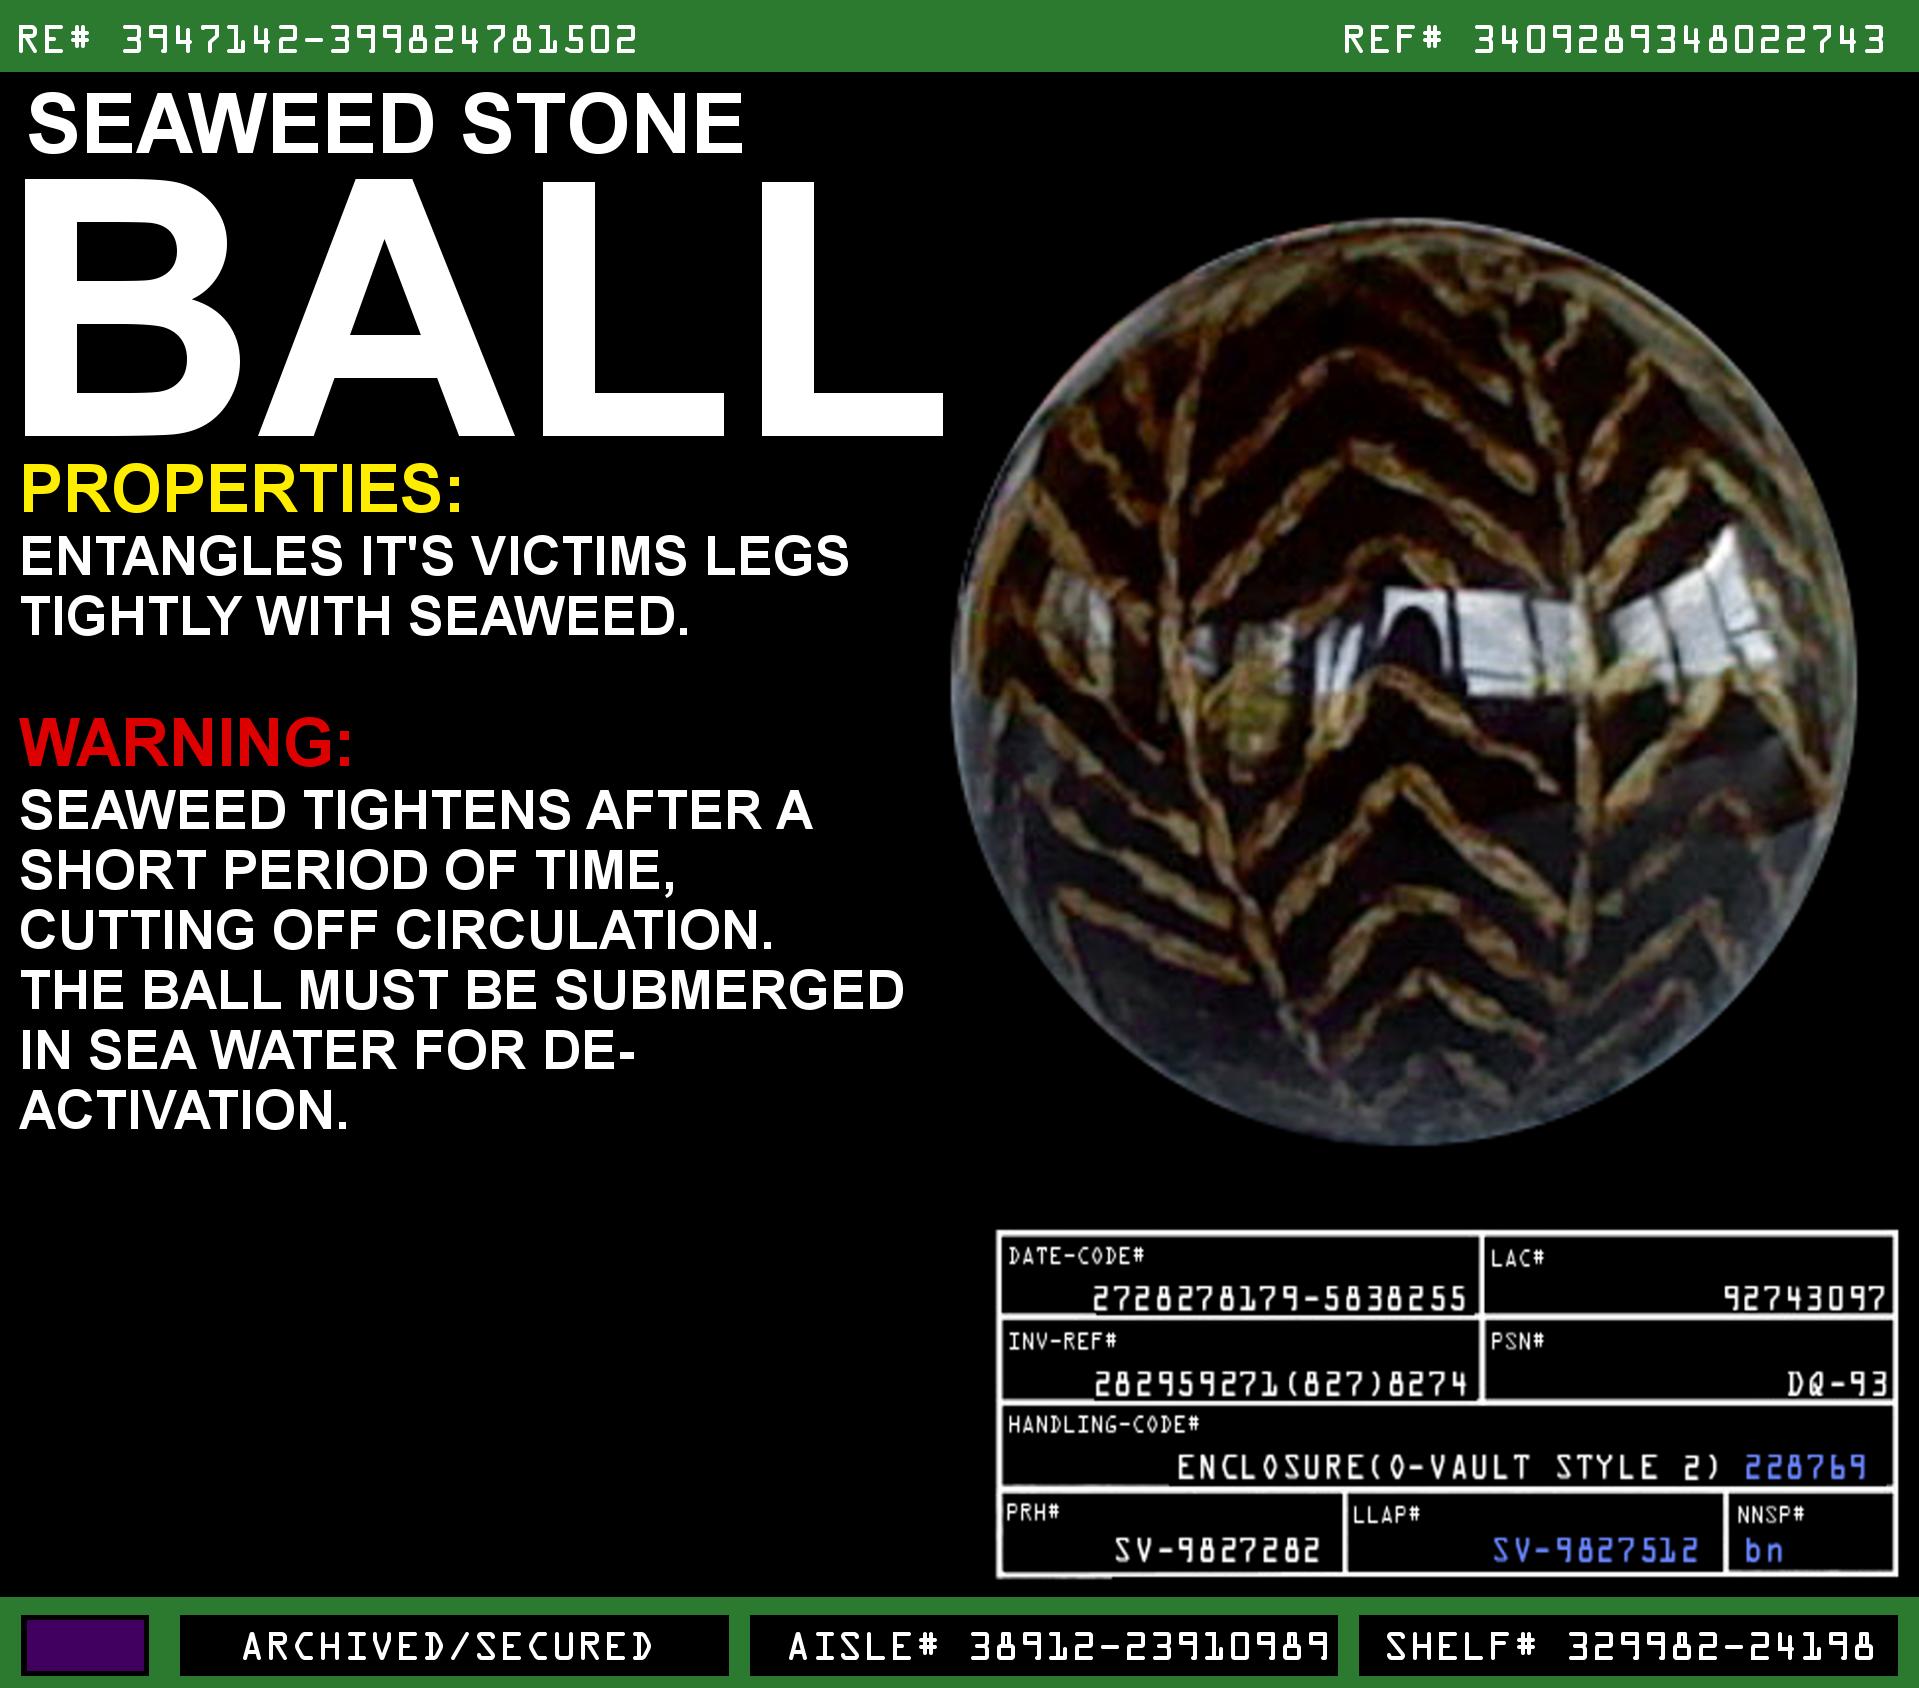 Seaweed Stone Ball